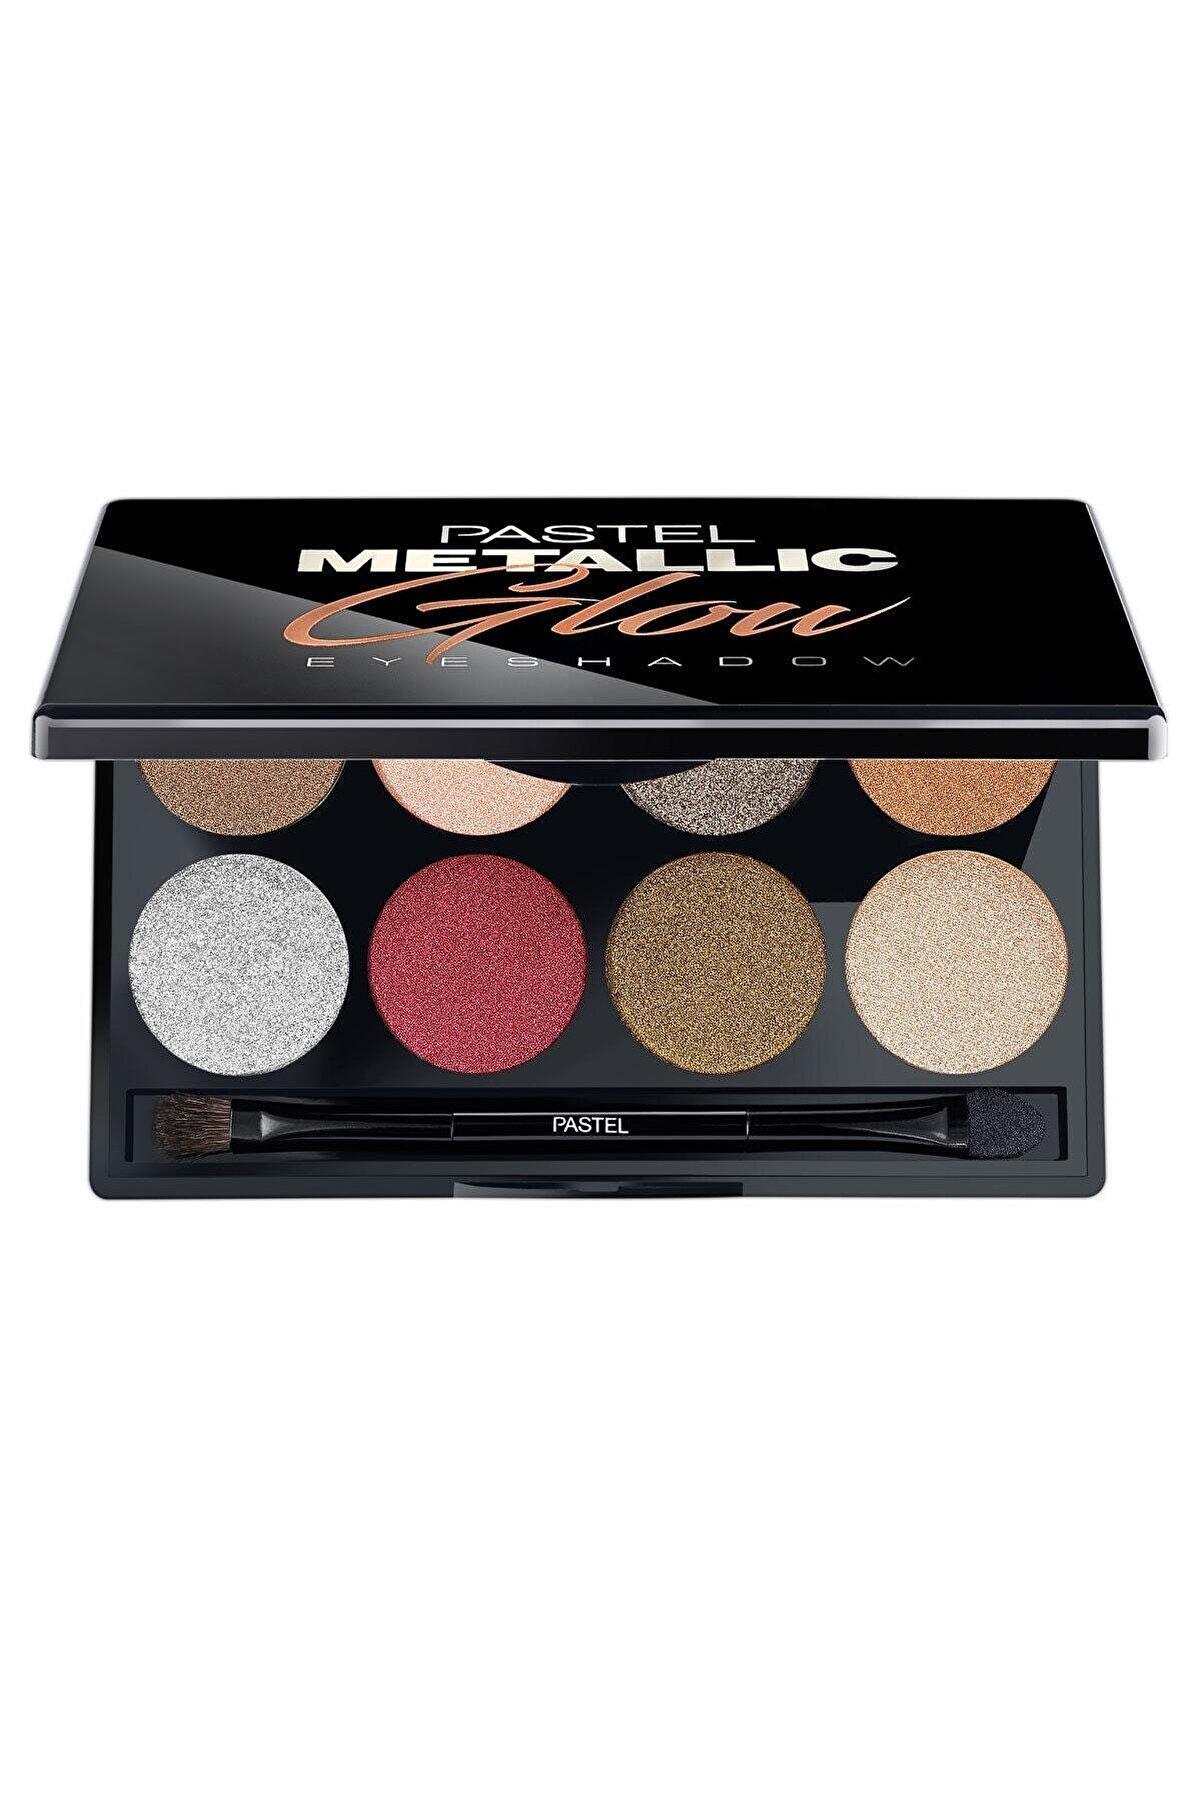 Pastel Göz Farı Paleti - Metallic Glow Eyeshadow